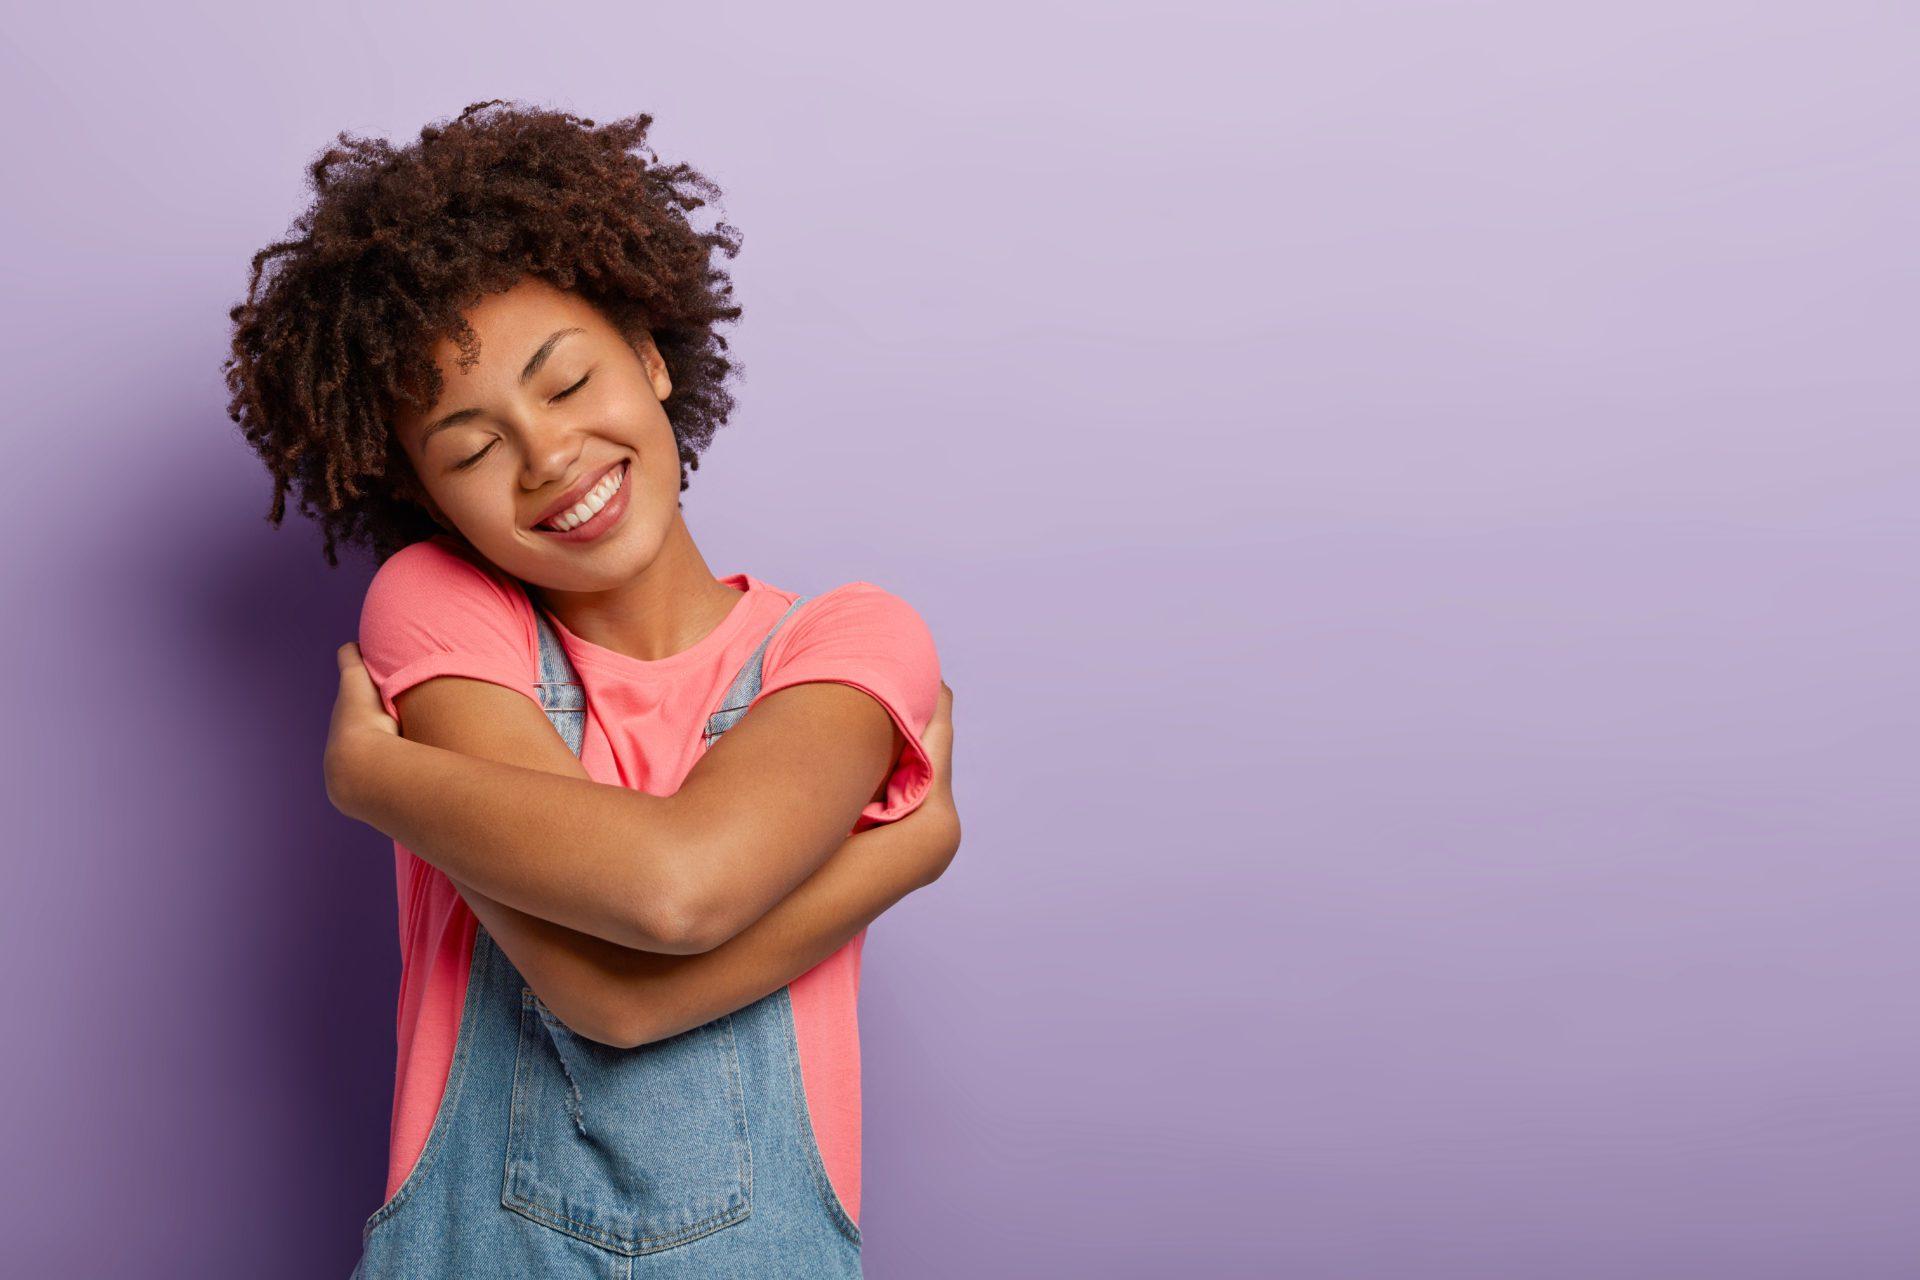 amor propio persona abrazándose